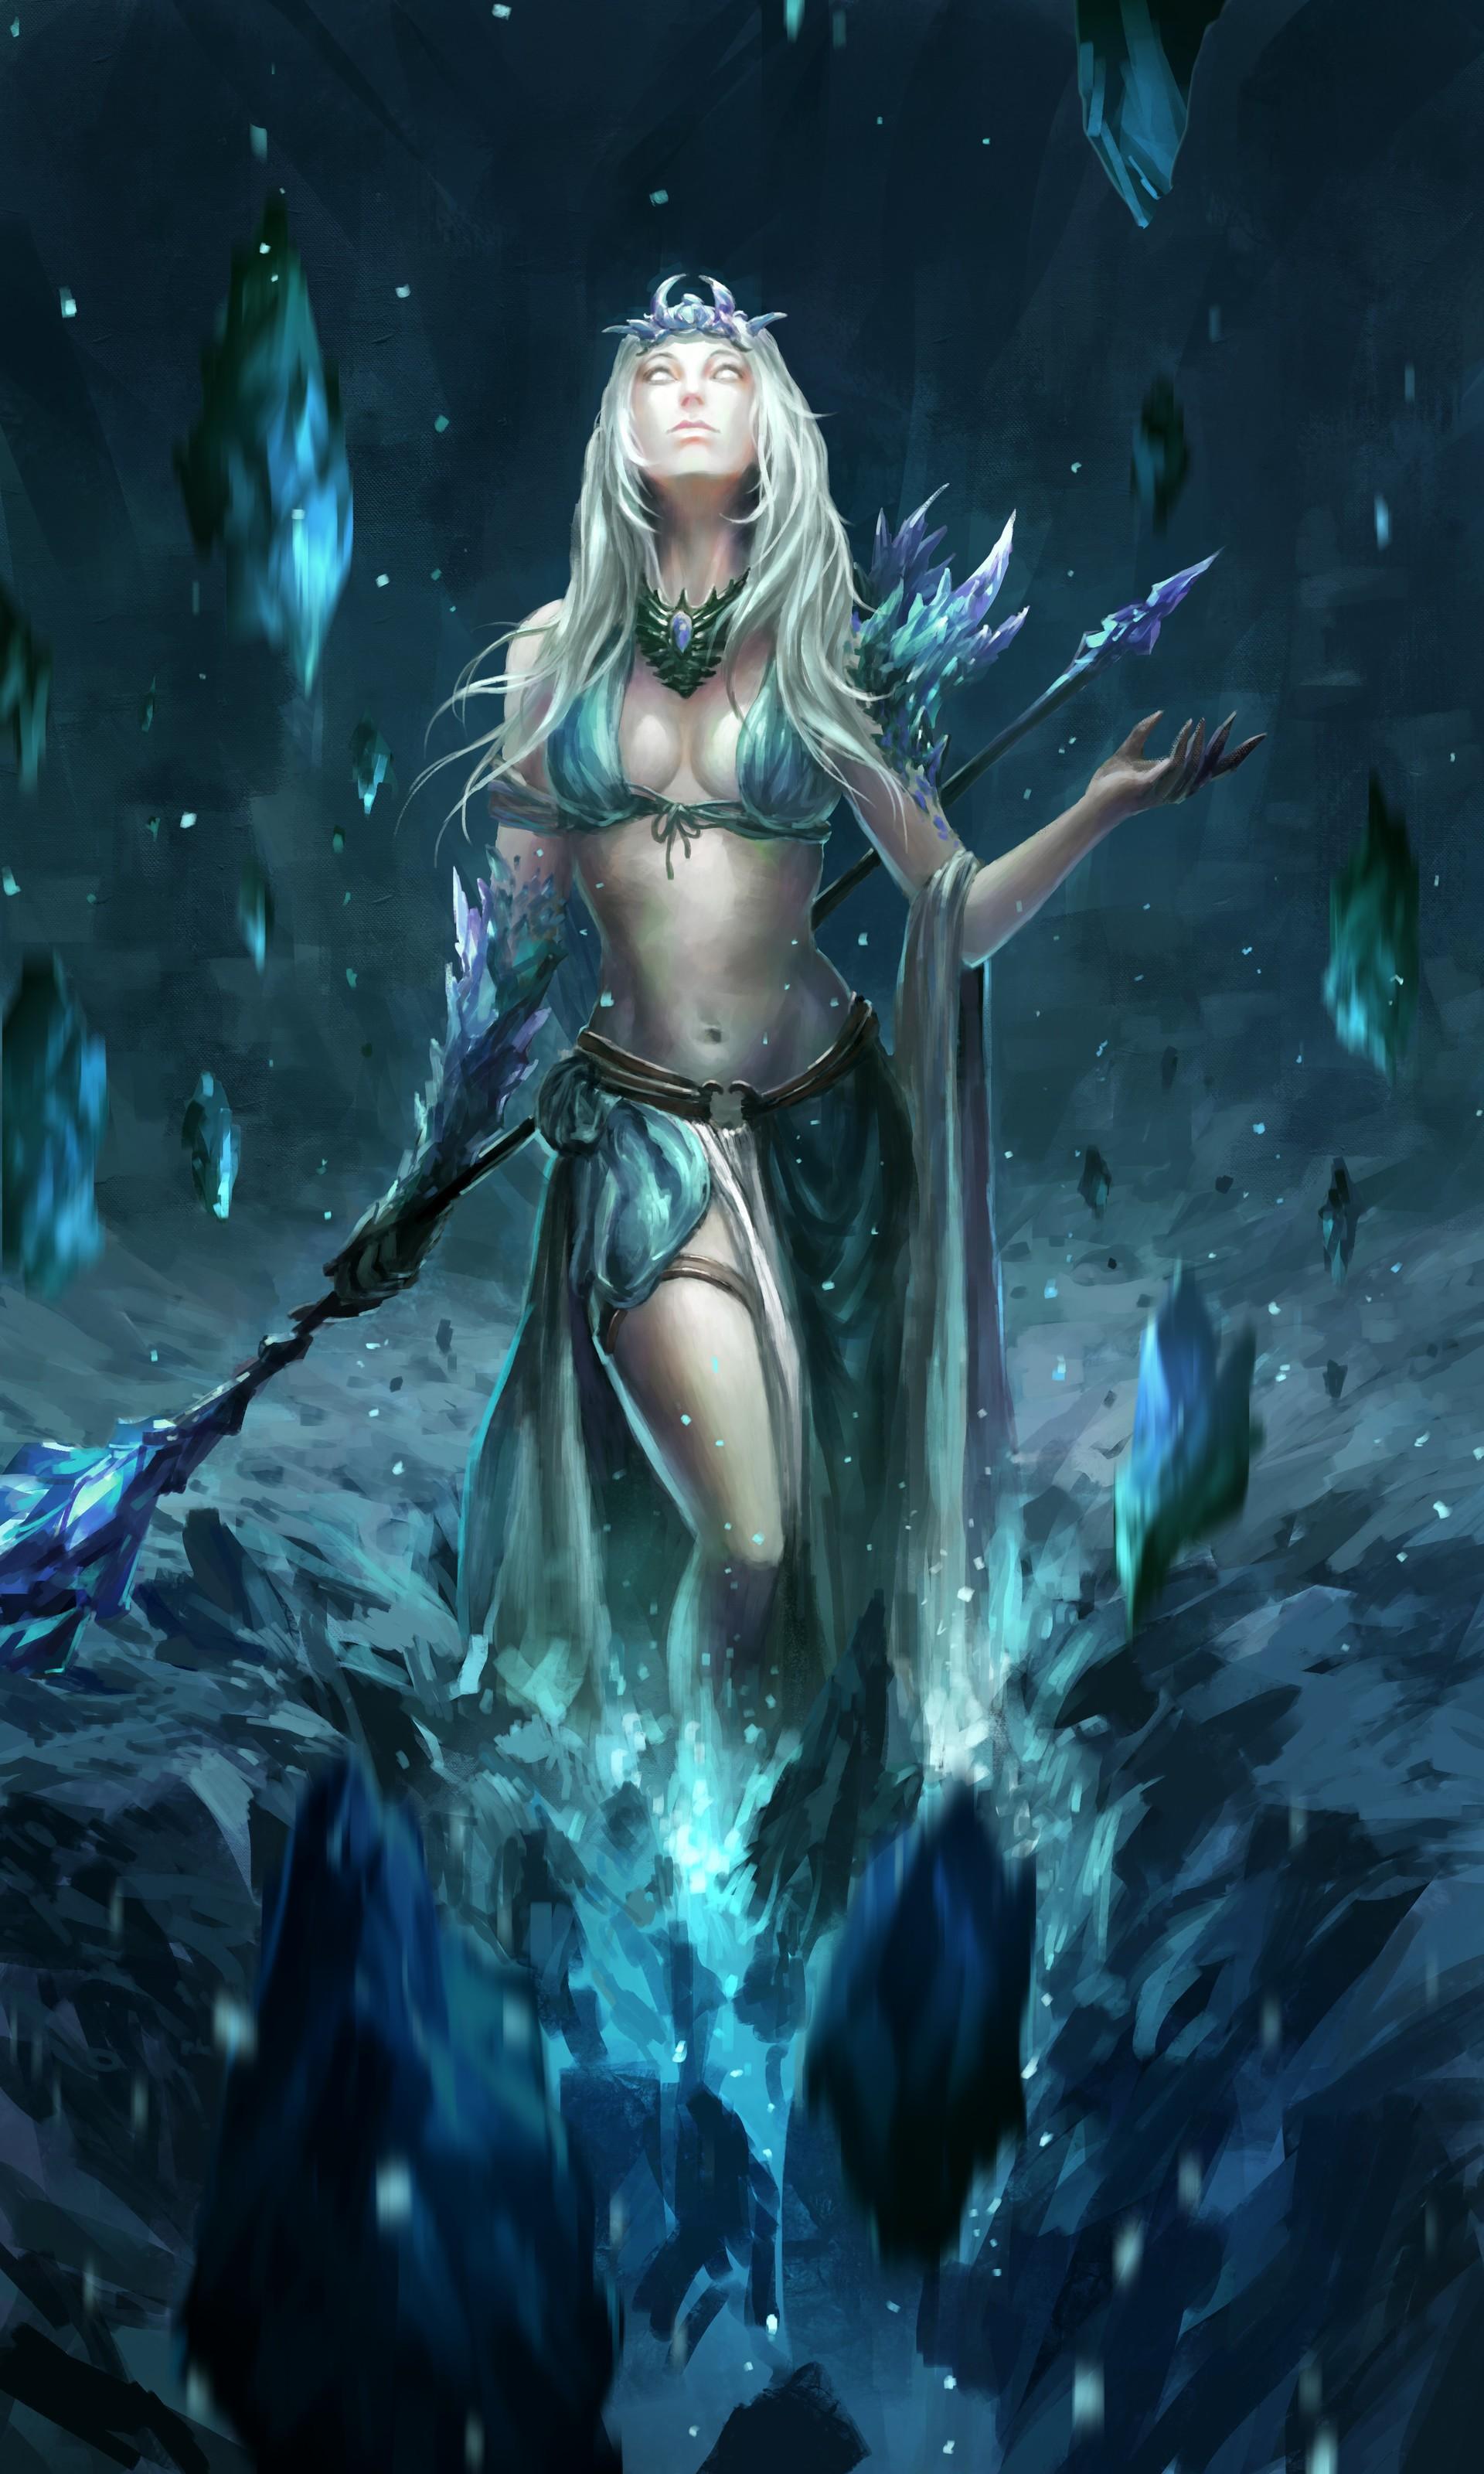 Wallpaper : Illustration, Fantasy Art, Anime, Mythology